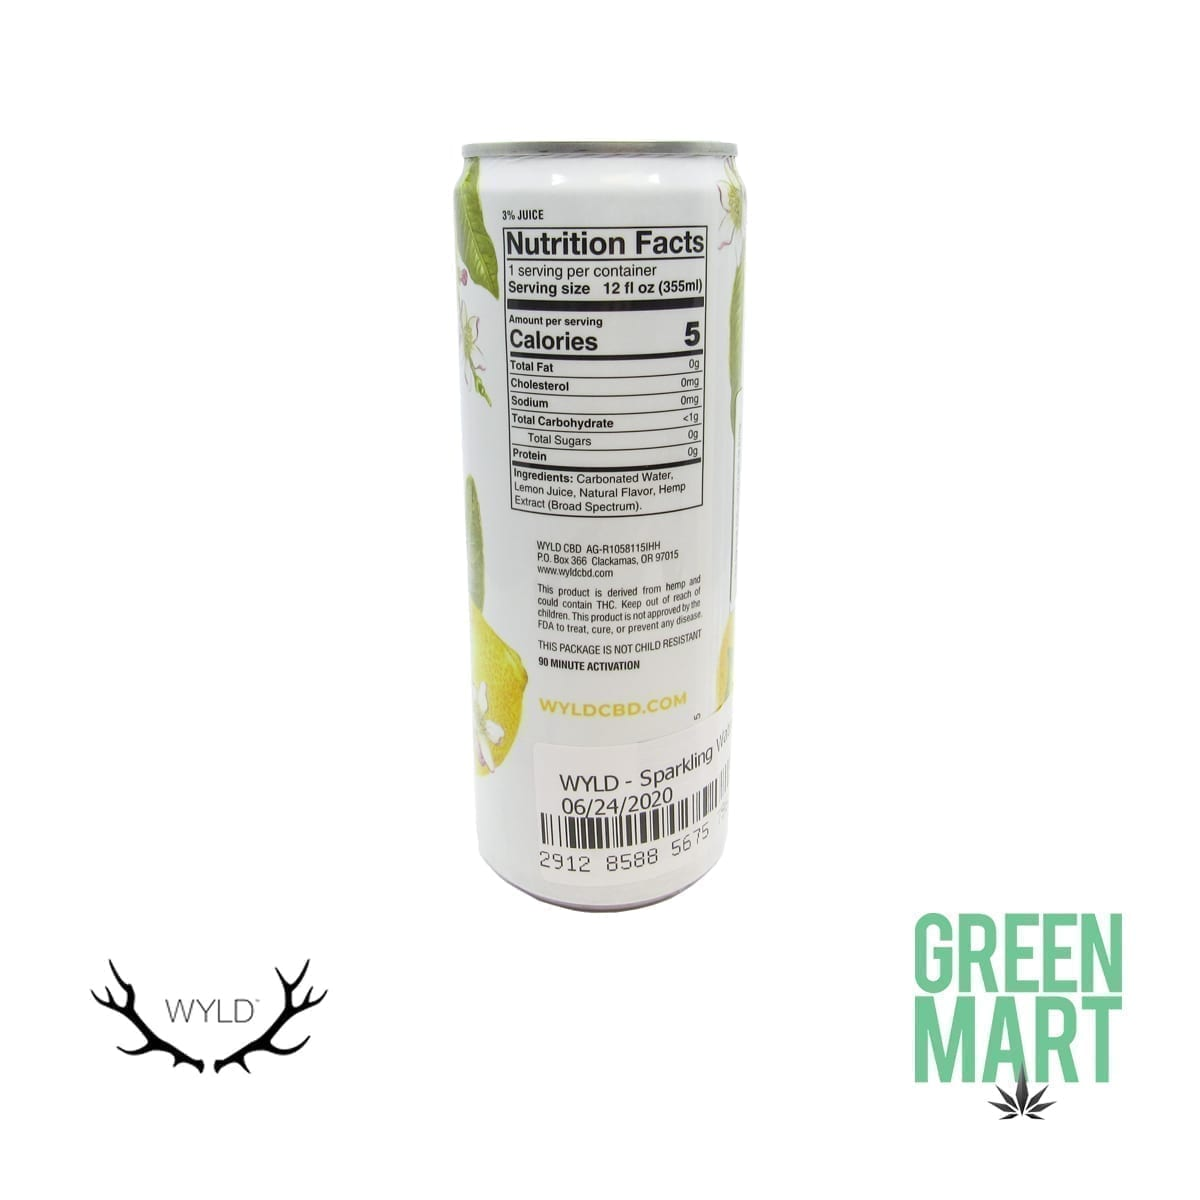 Wyld Lemon CBD Sparkling Water Nutrition Facts